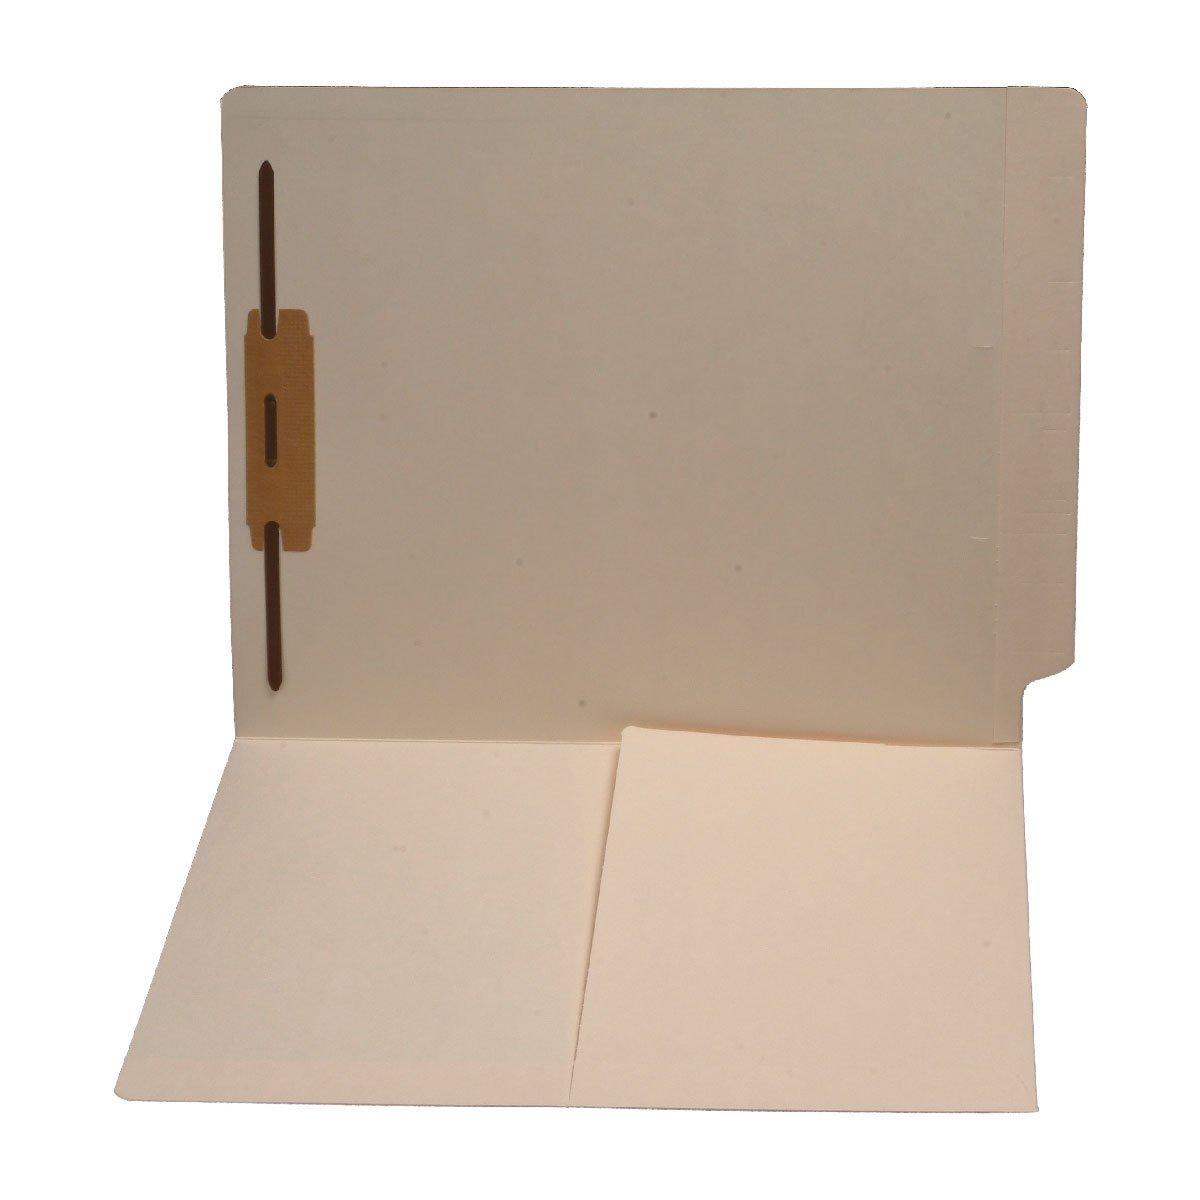 11 pt Manila Folders, Full Cut End Tab, Letter Size, 1/2 Pocket Inside Front, Fastener Pos #1 (Case of 250)